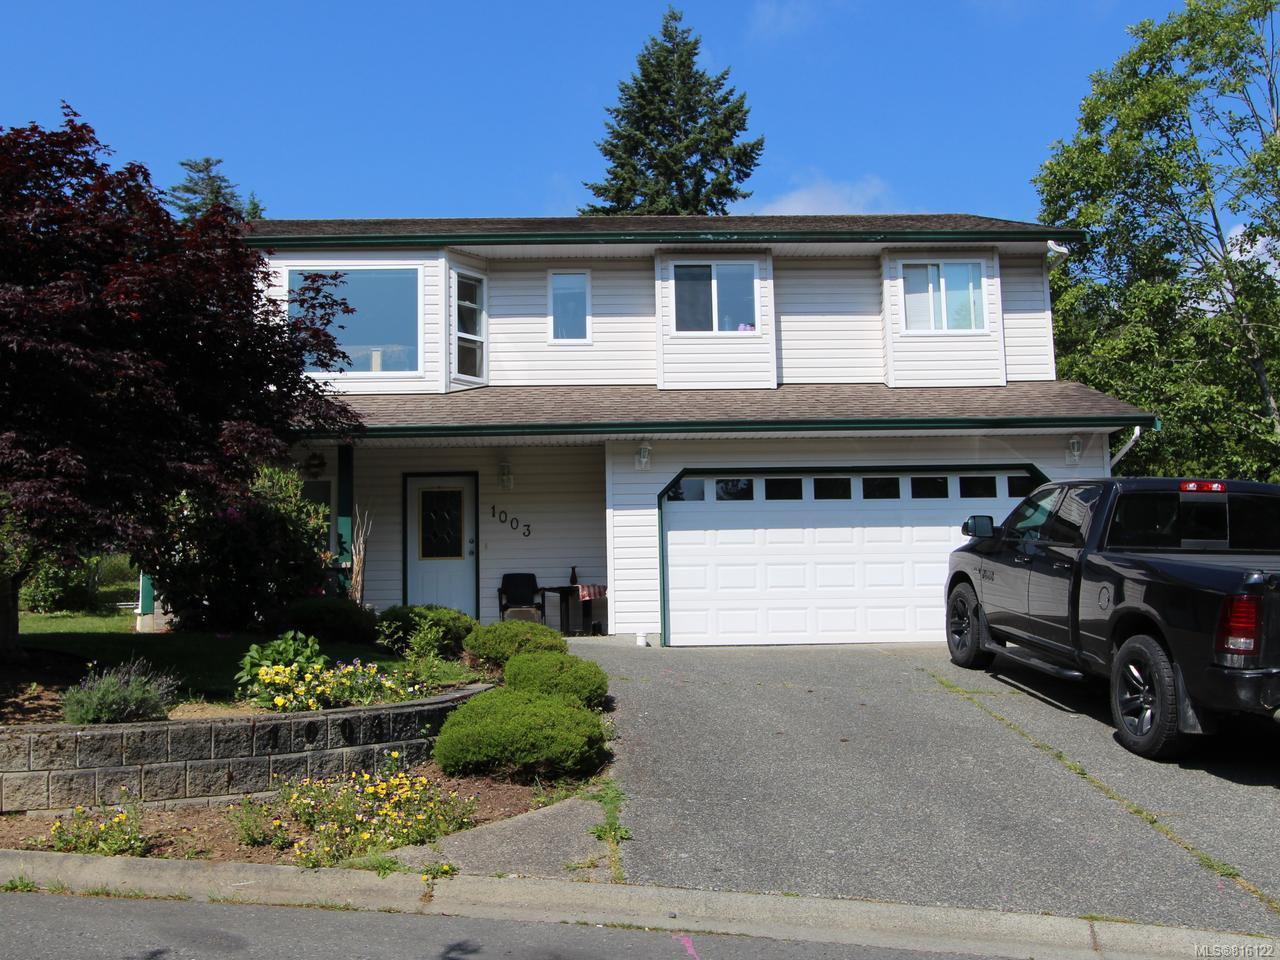 Main Photo: 1003 Bramblewood Lane in NANAIMO: Na South Nanaimo House for sale (Nanaimo)  : MLS®# 816122